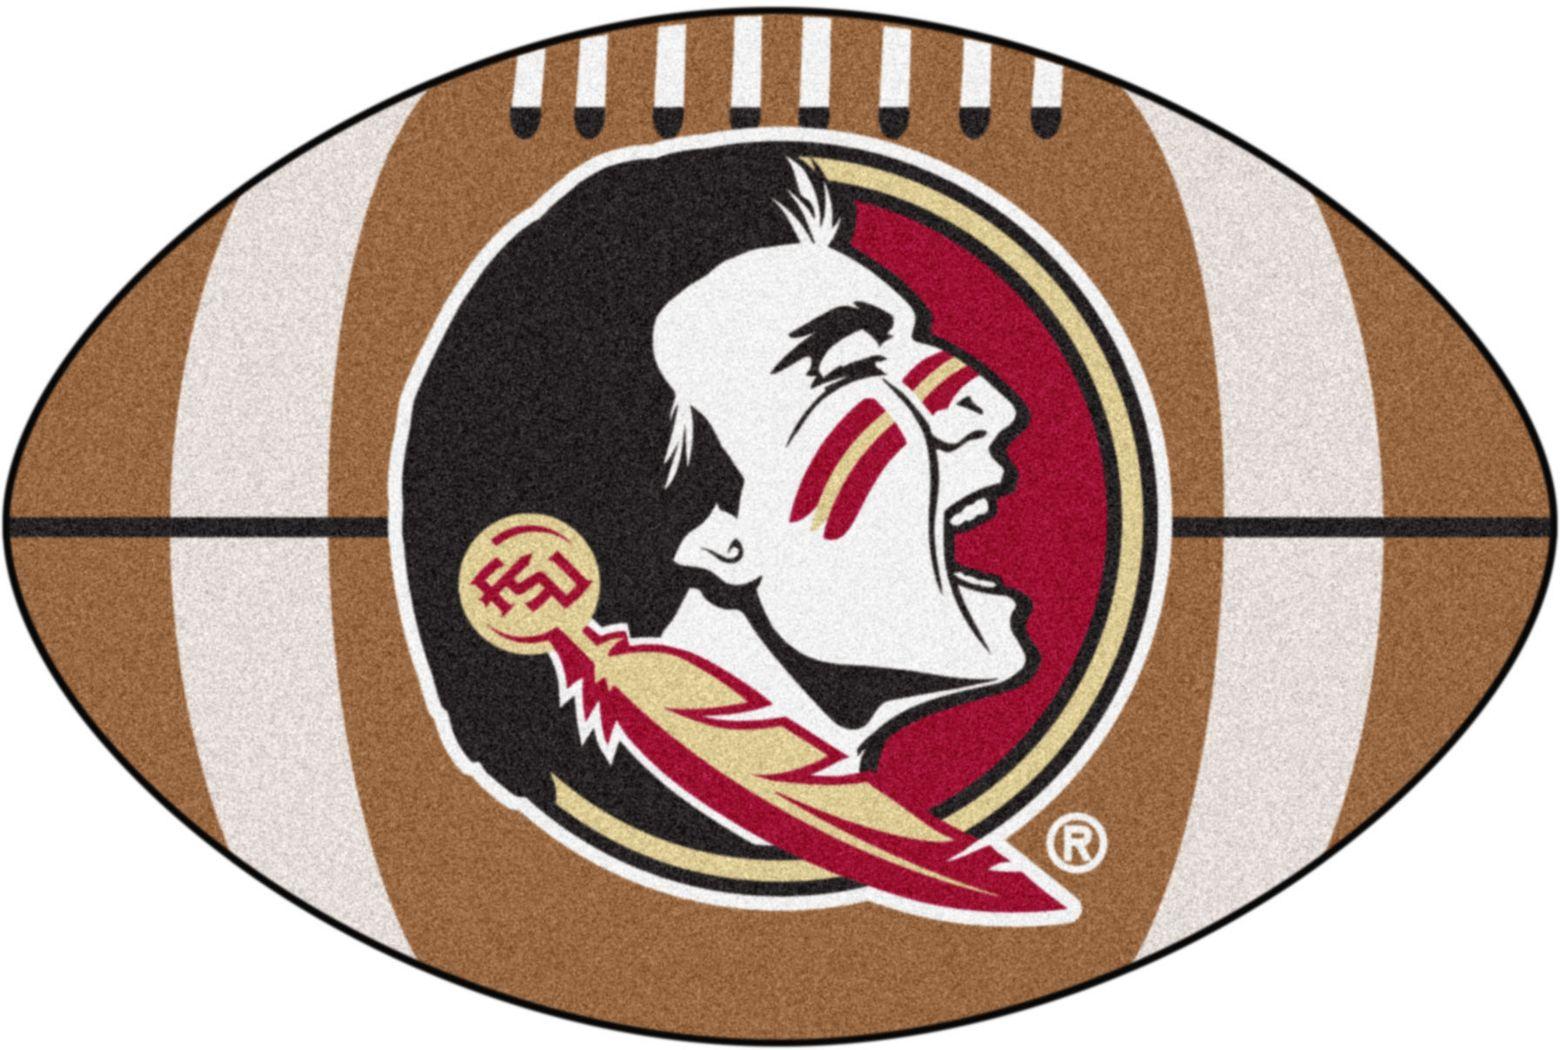 "NCAA Football Mascot Florida State University 1'6"" x 1'10"" Rug"